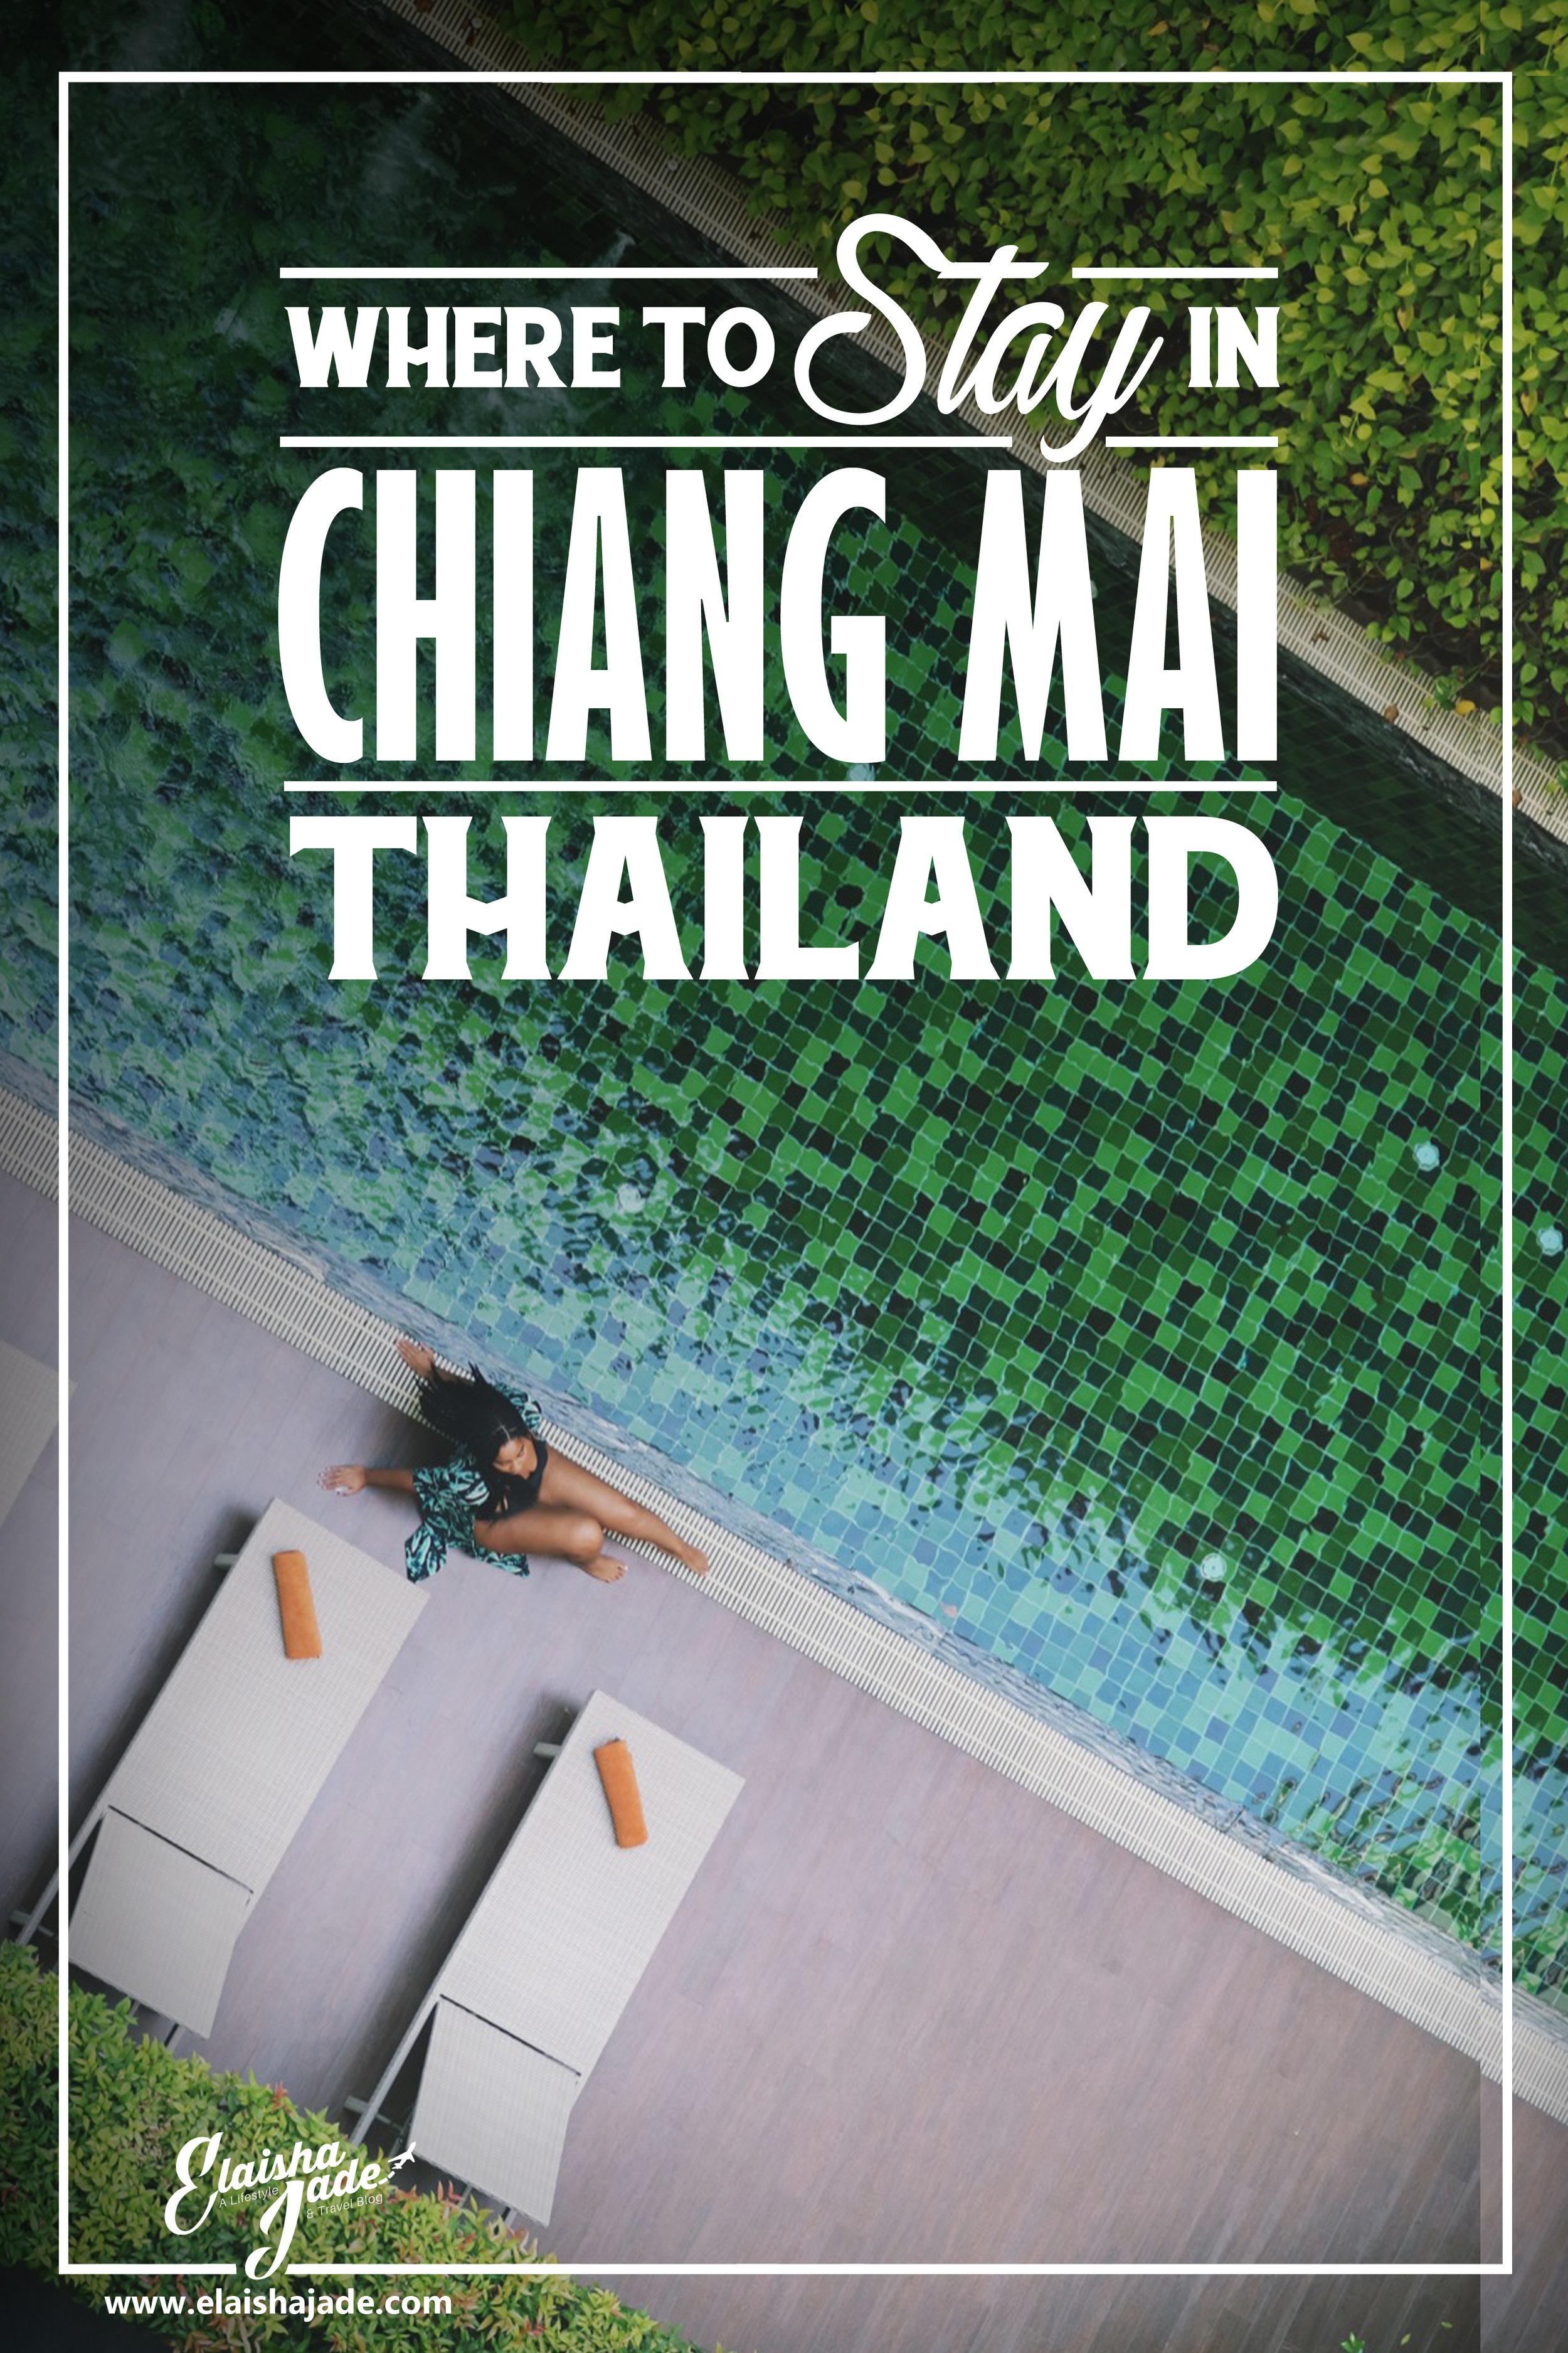 x2 vibe decem hotel chiang mai thailand